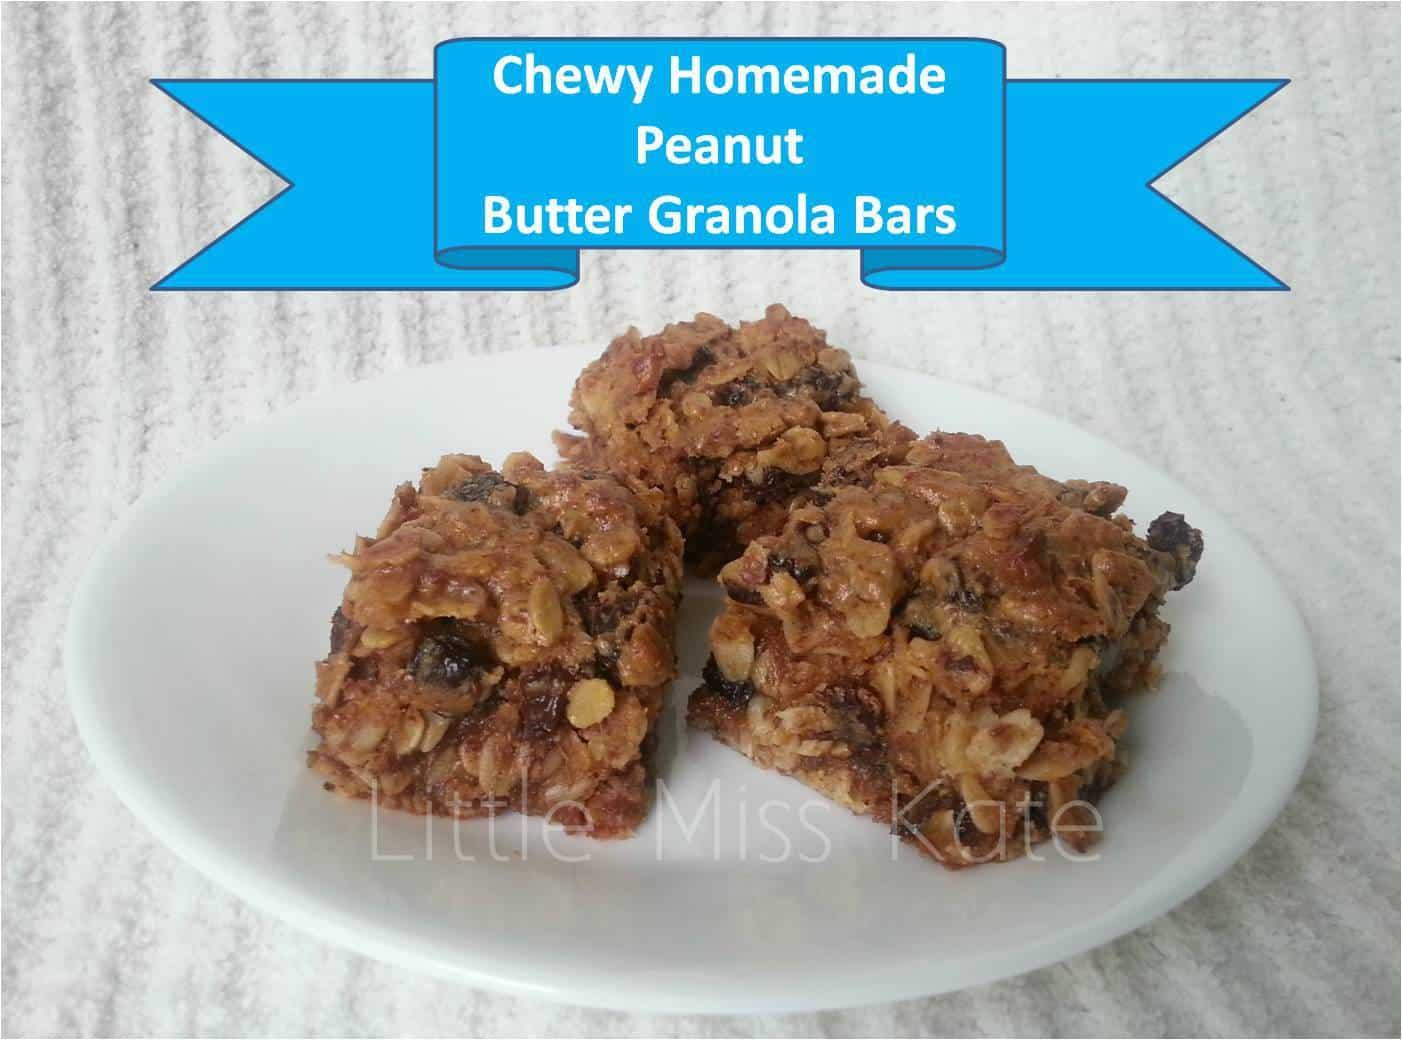 Homemade Peanut Butter Raisin Granola Bar Recipe